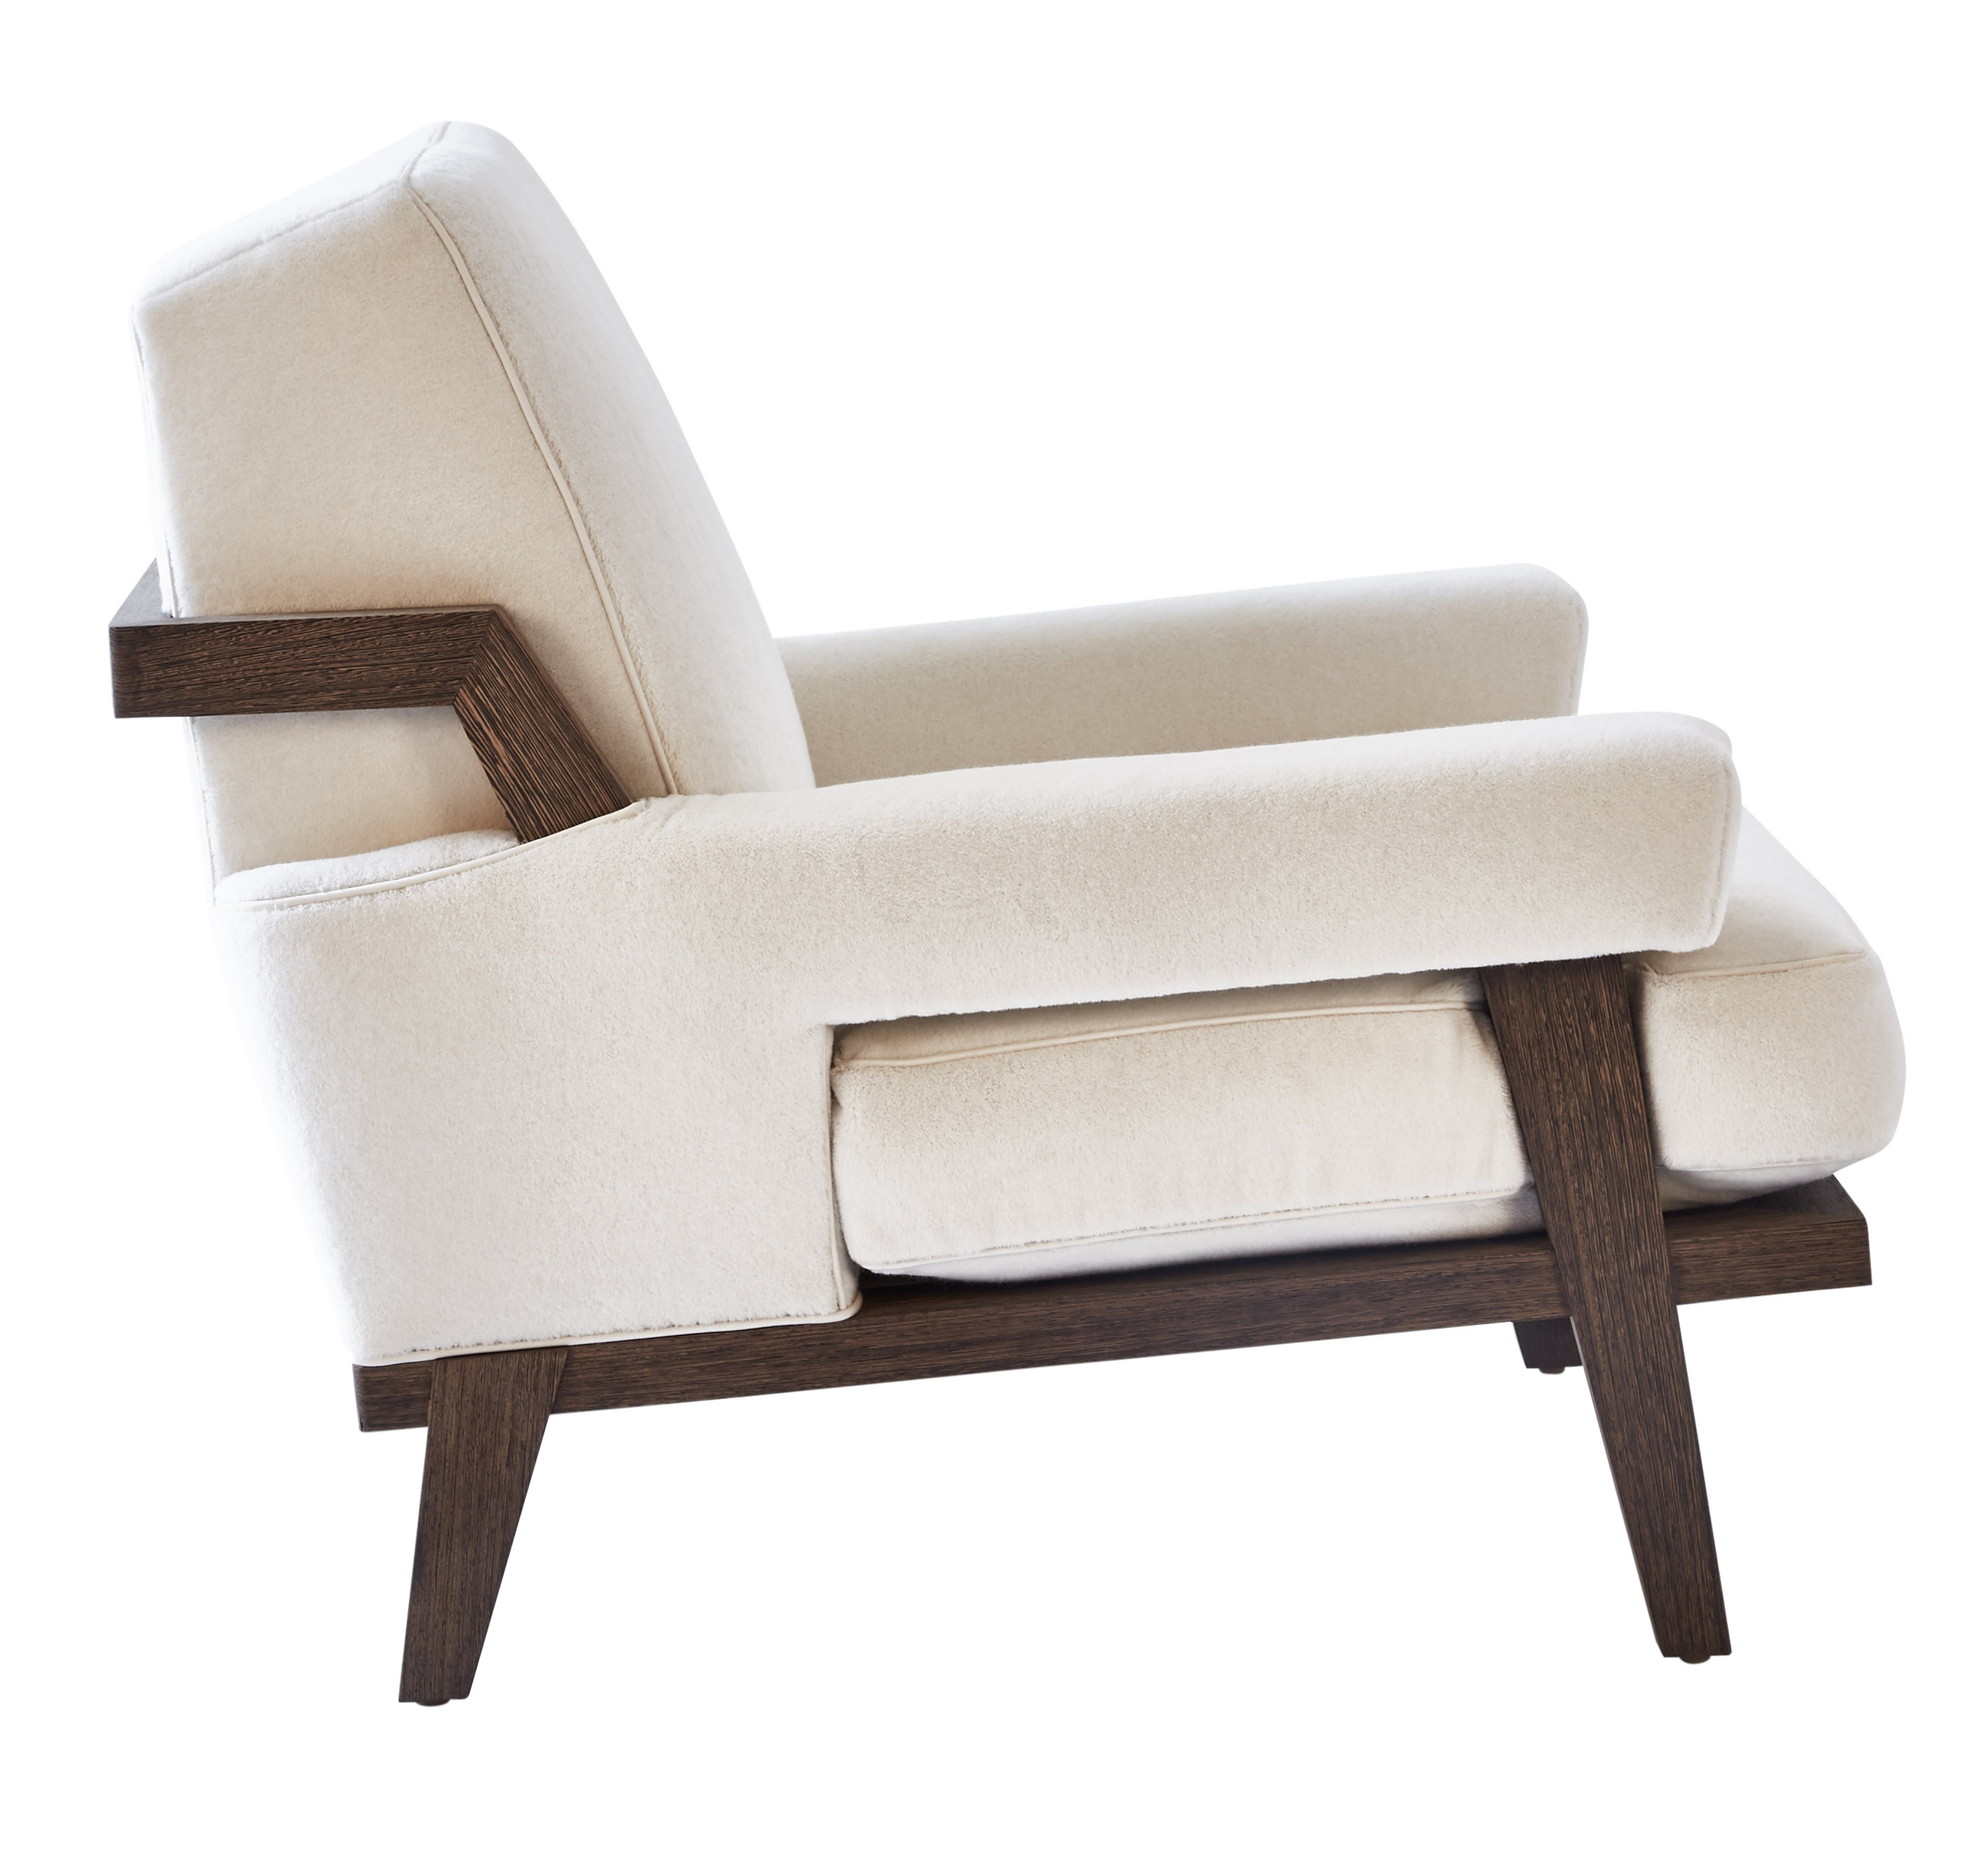 Kimberly Denman Cigar Lounge Chair By Kimberly Denman Com 55 Yds  # Muebles Kimberly